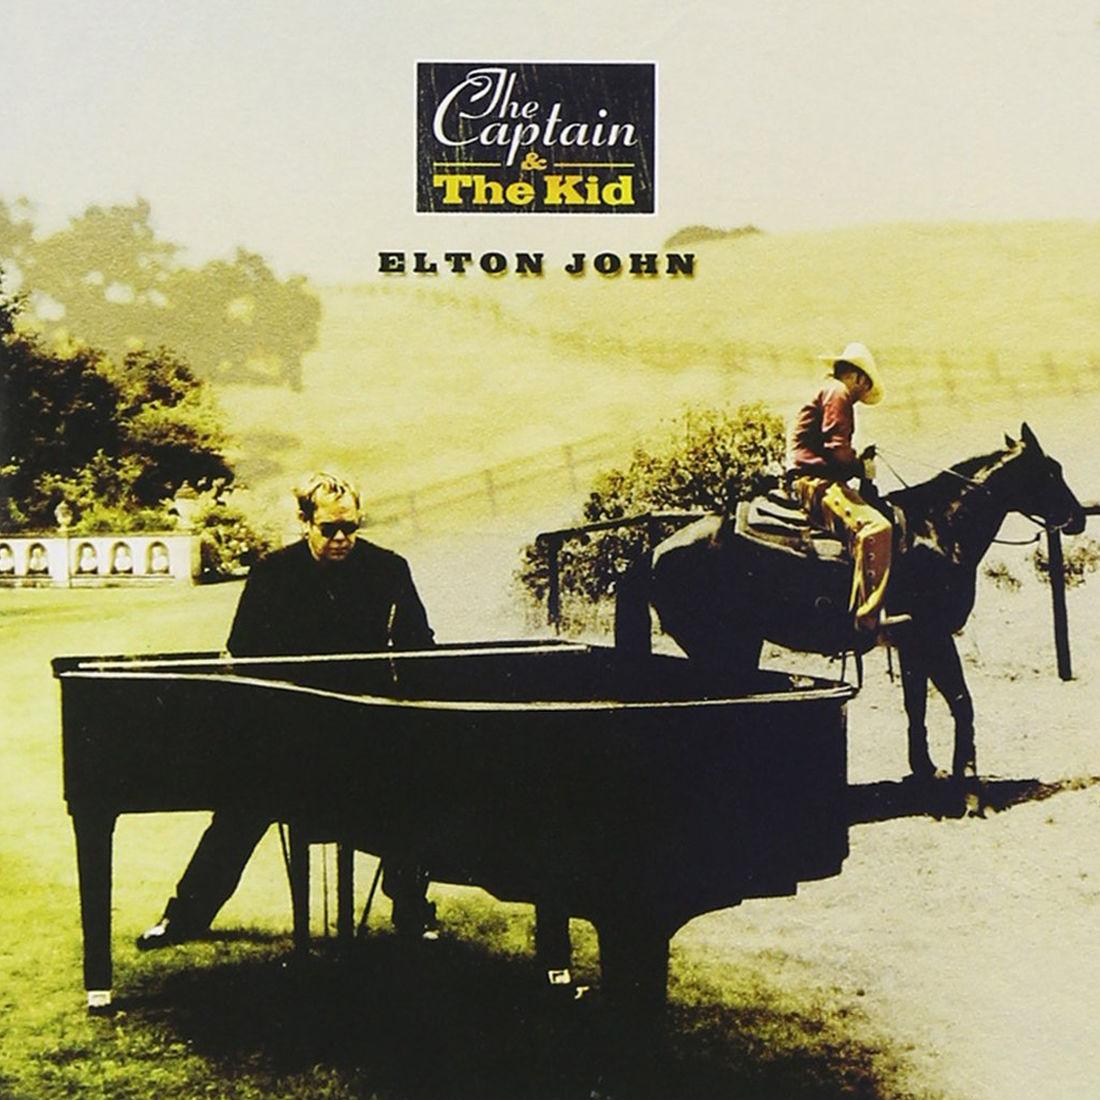 Elton John: The Captain and The Kid